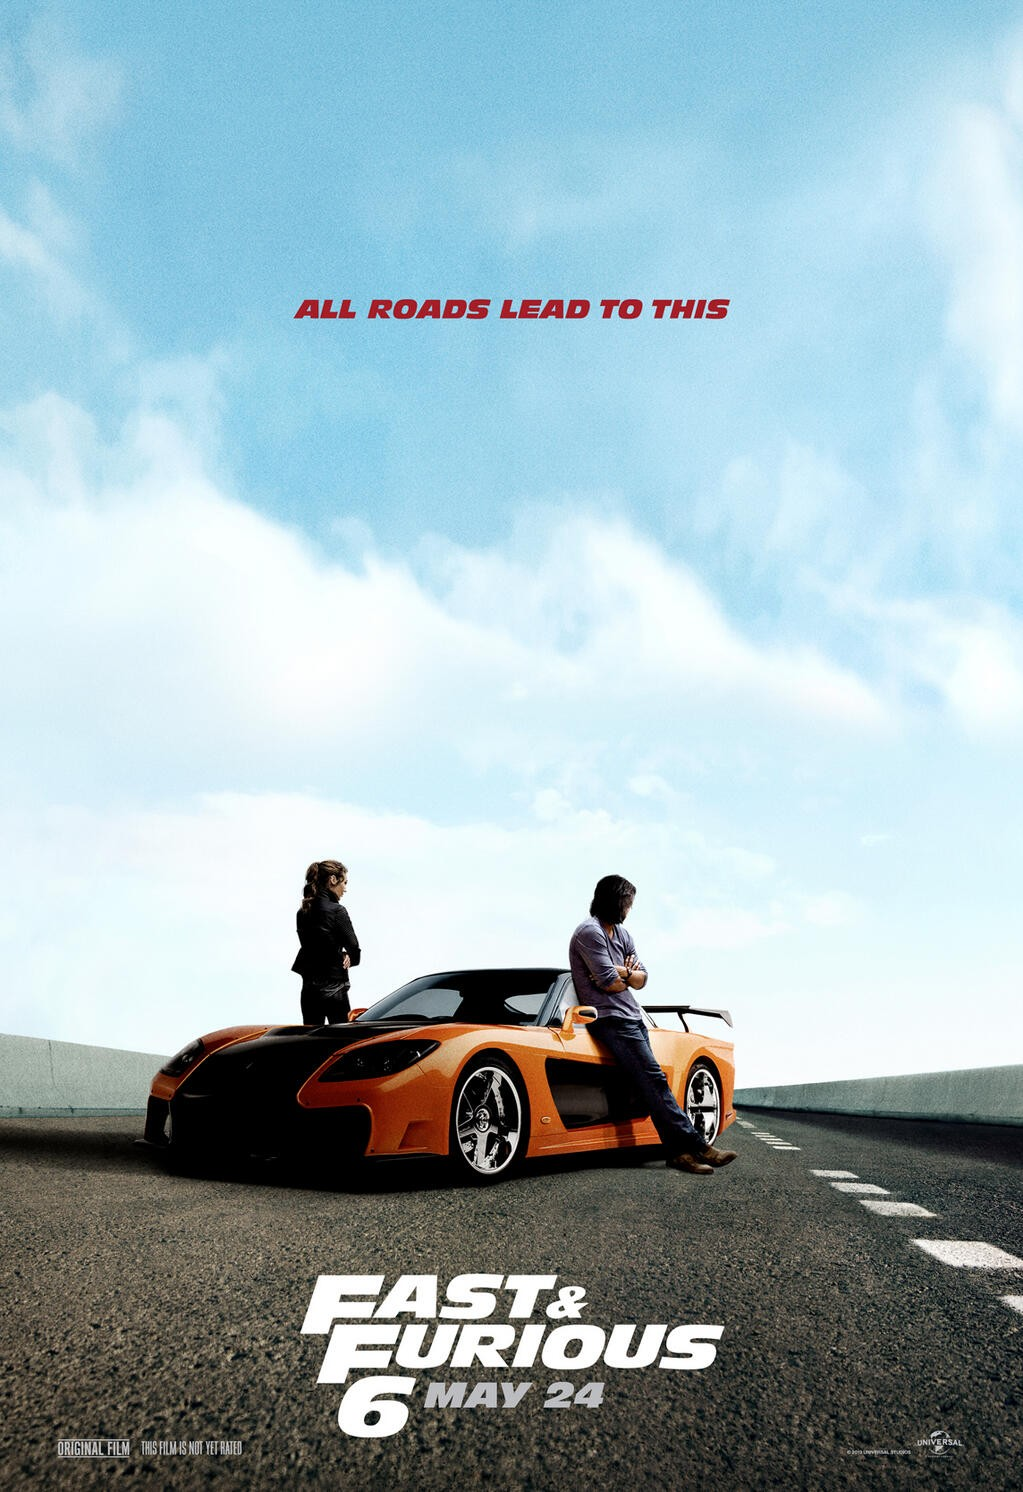 Fast-and-Furious-6-Poster-Gal-Gadot-and-Sung-Kang